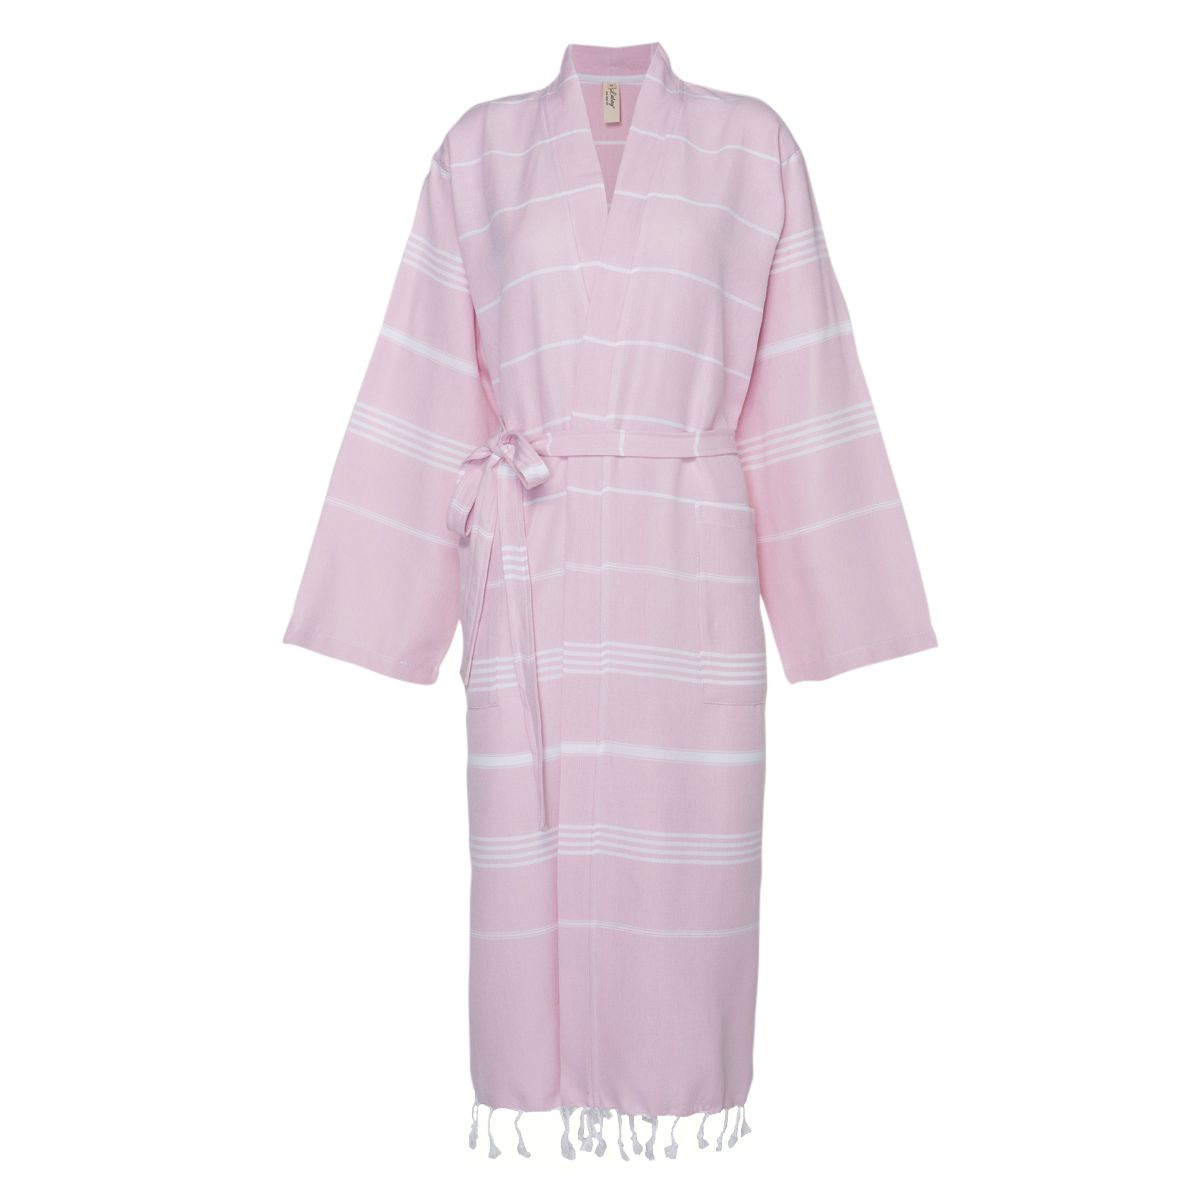 Bathrobe Leyla / Kimono Collar - Rose Pink